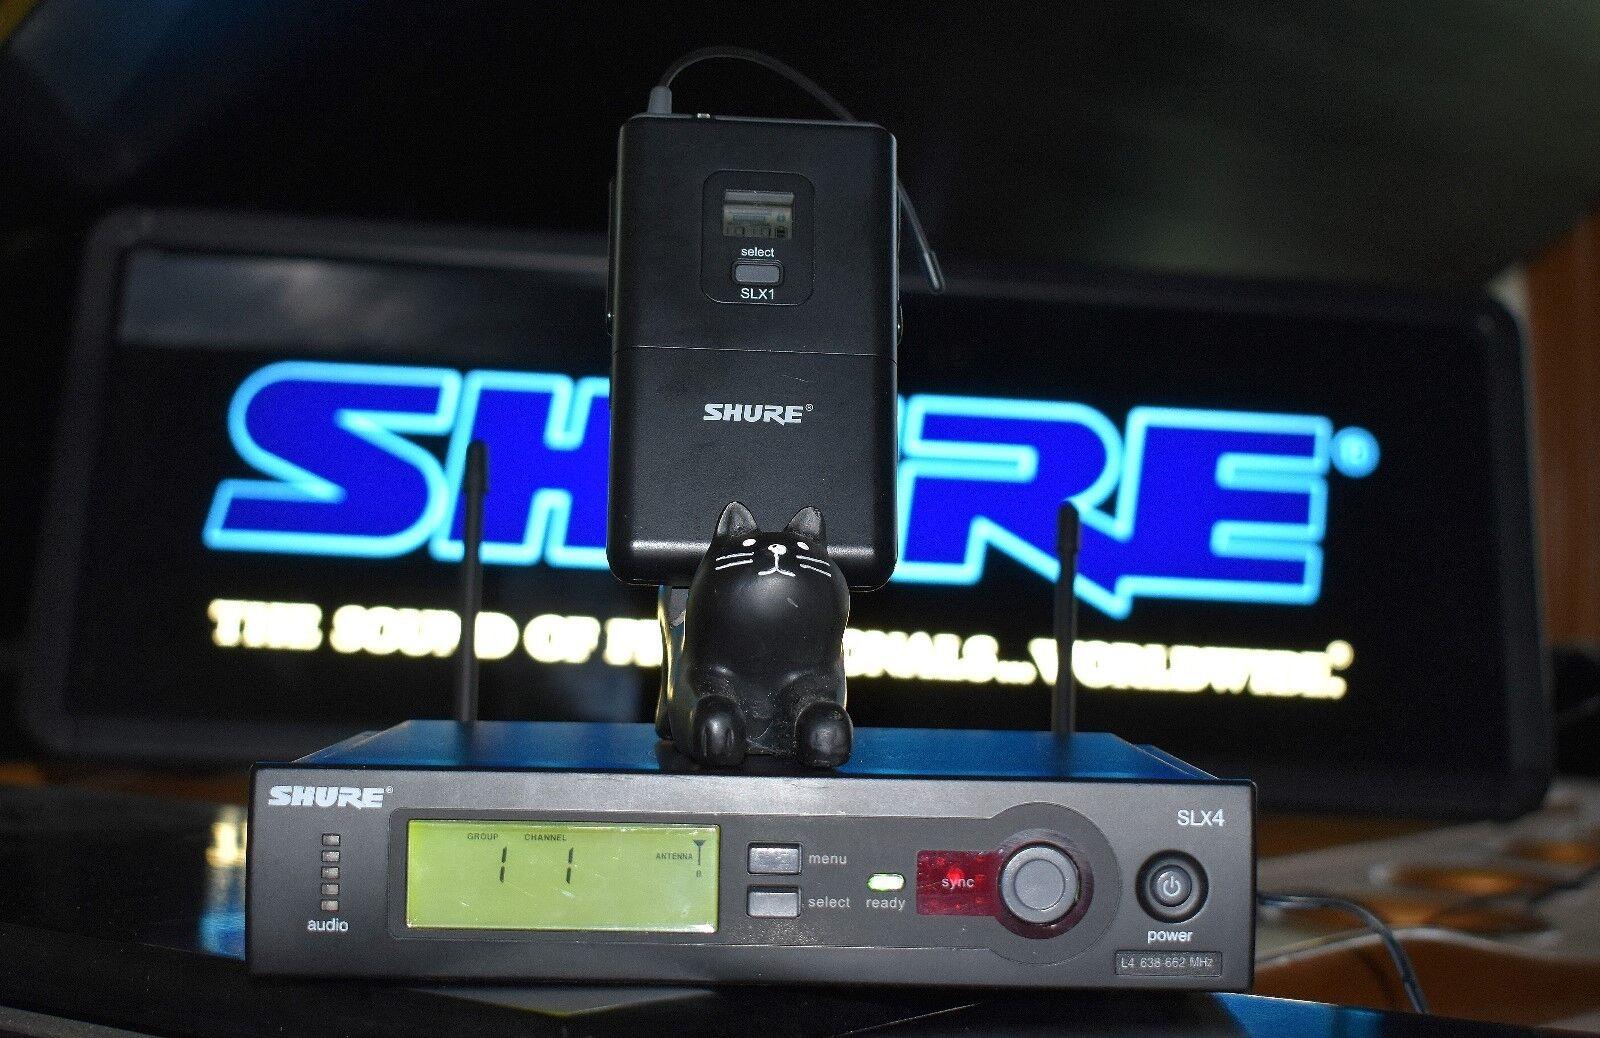 Shure SLX14 UHF Wireless Body Pack System SLX1 SLX4